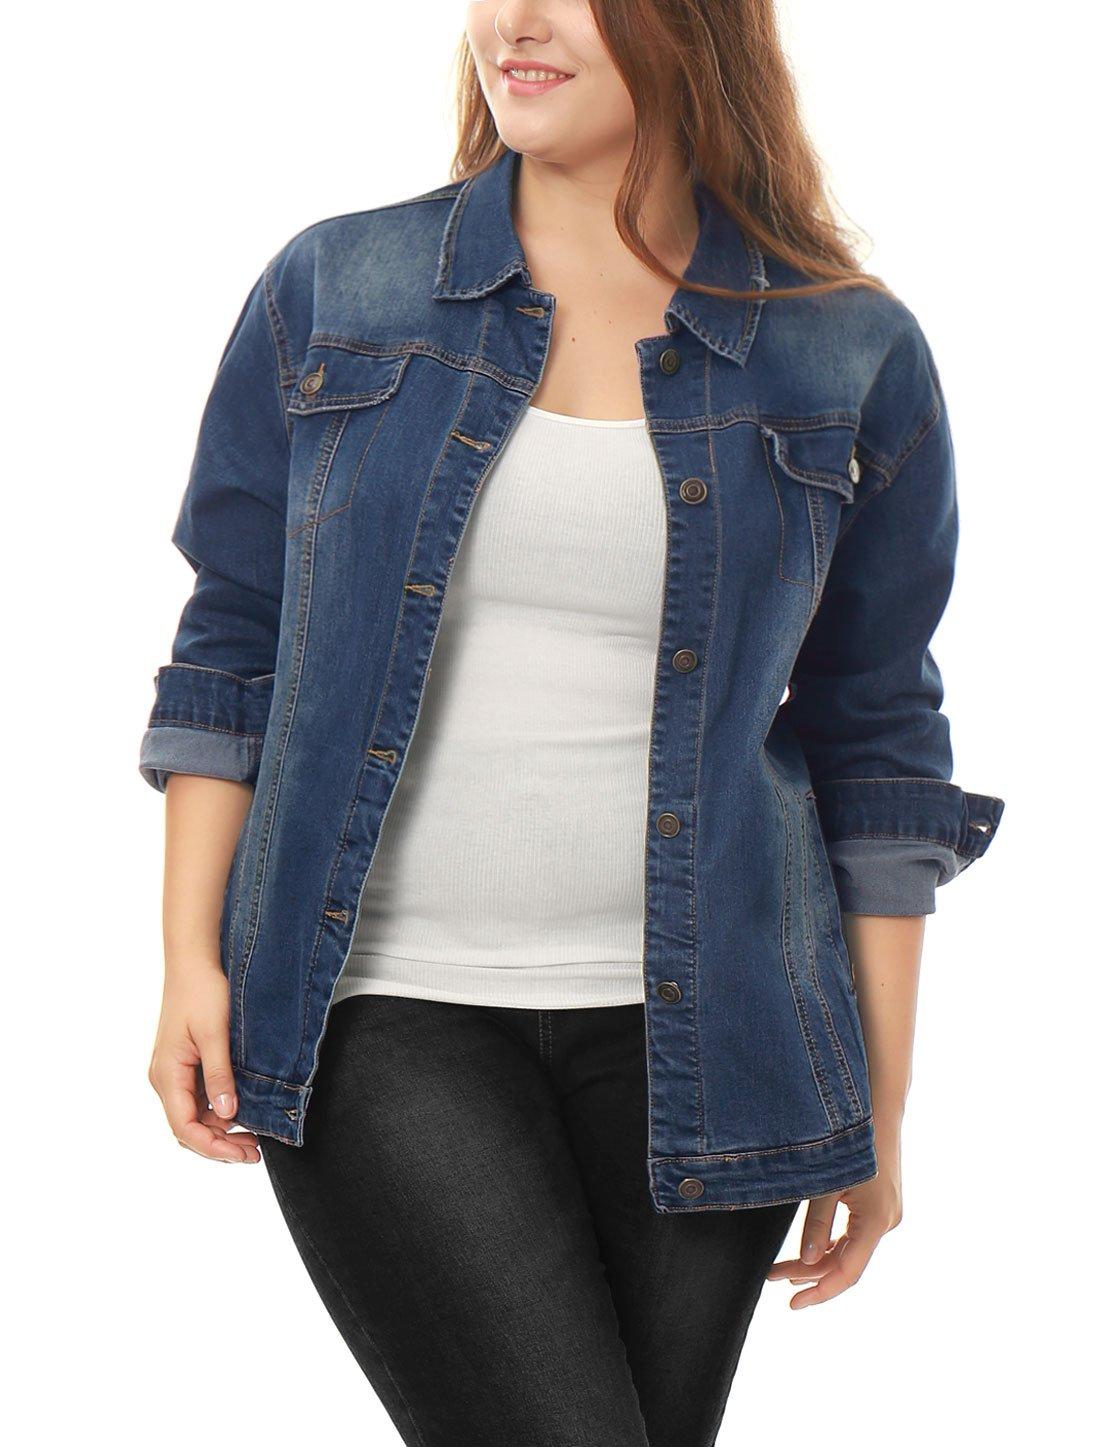 Allegra K Women's Plus Size Button Down Washed Denim Jacket w Chest Flap Pocket g16060200ux0003